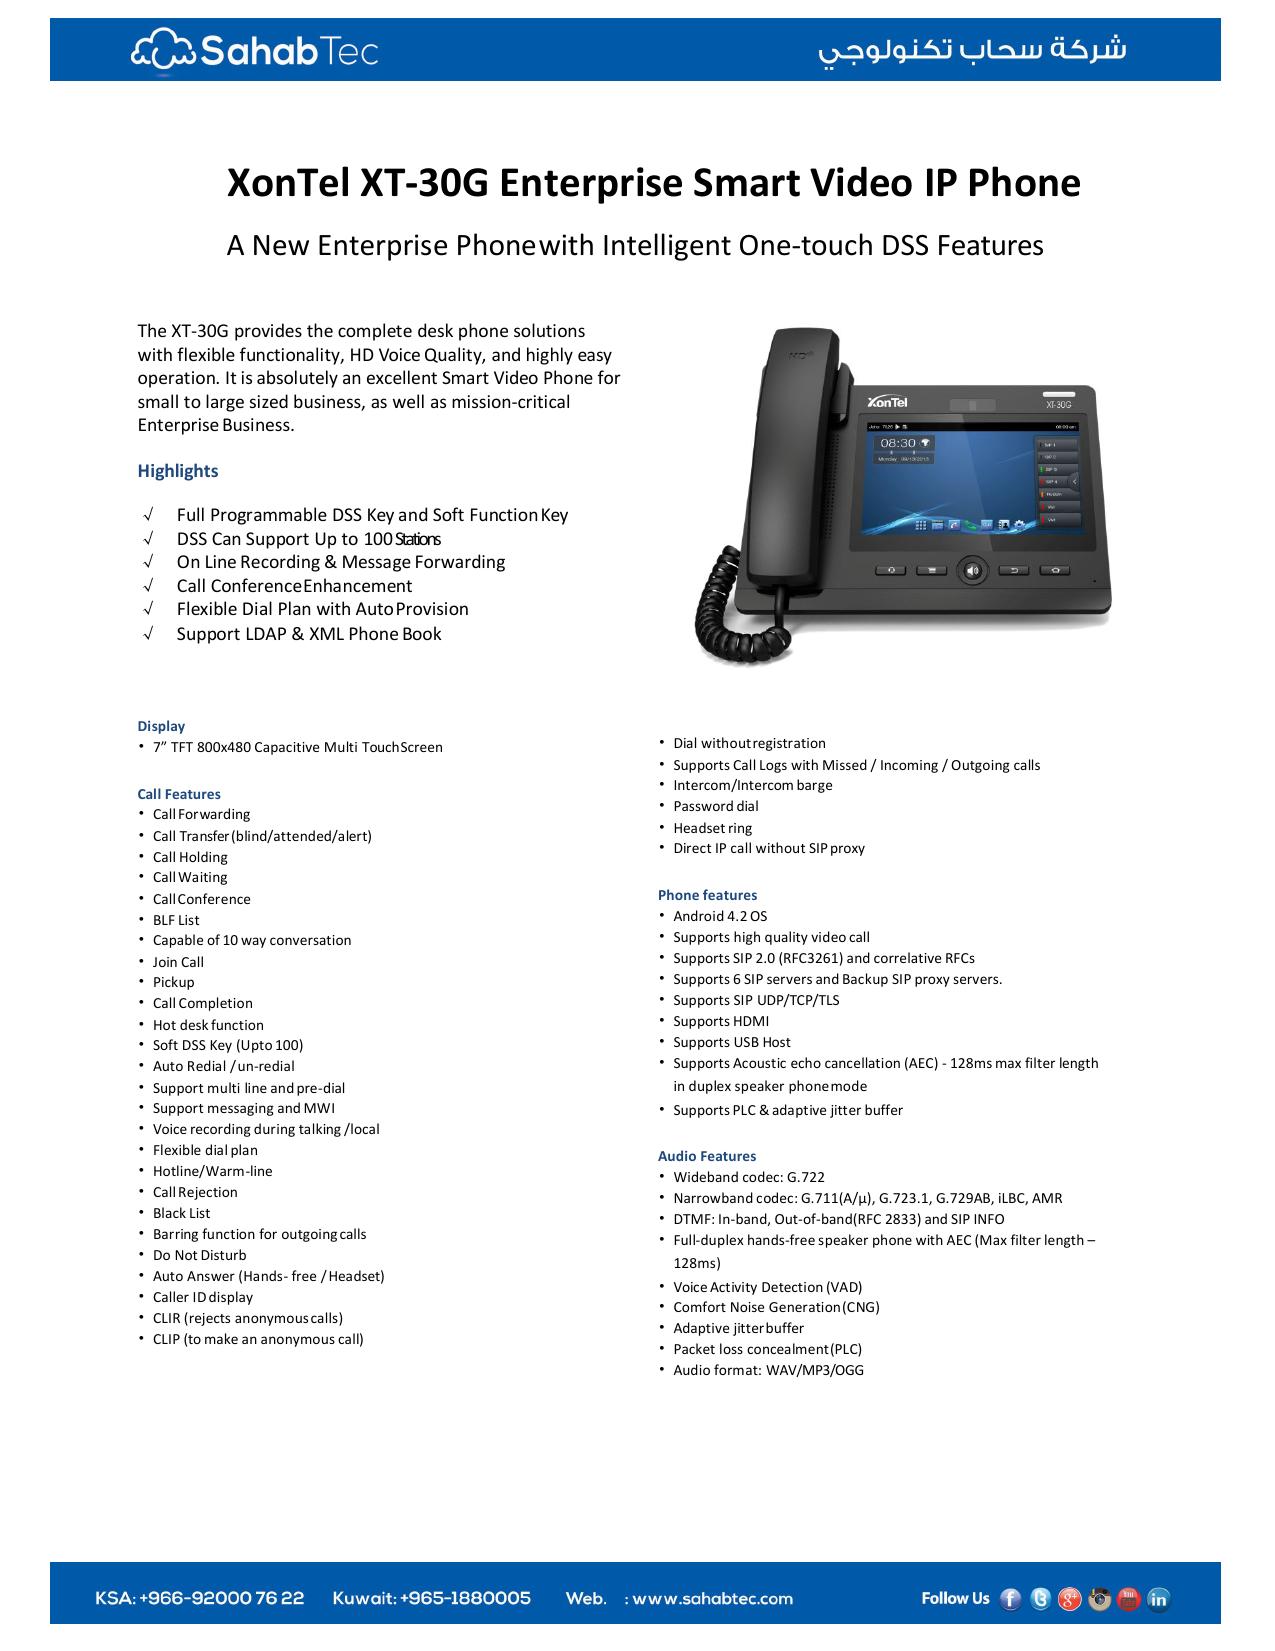 XonTel XT-30G Enterprise Smart Video IP Phone   manualzz com